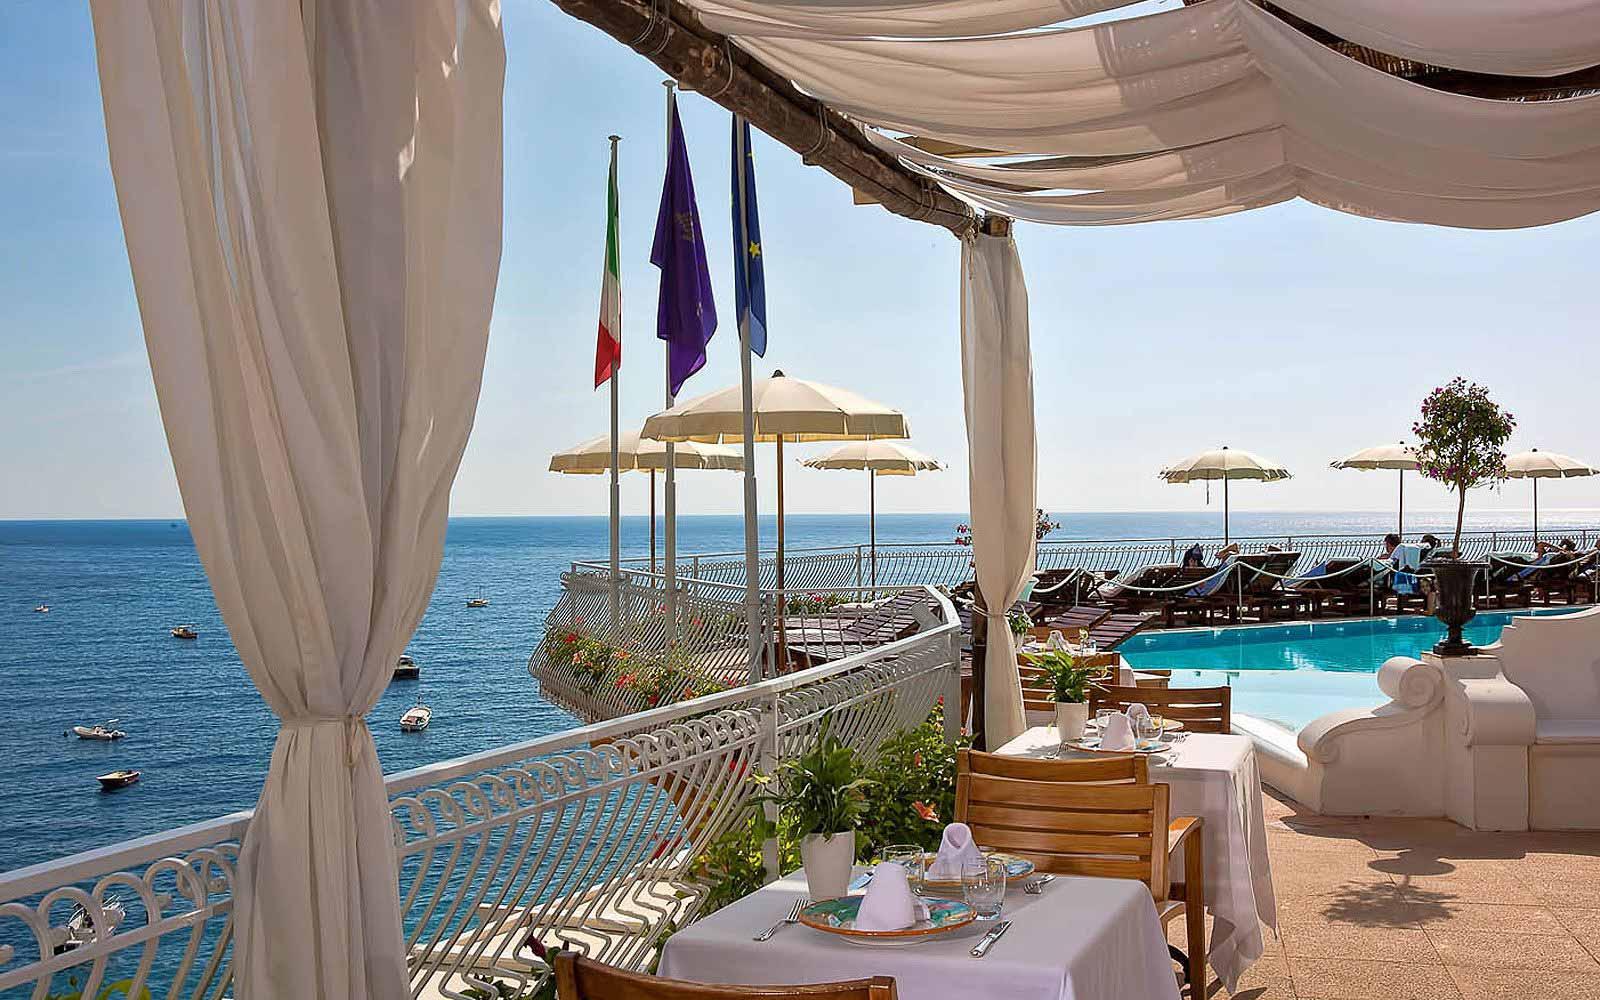 Pool Restaurant at Covo Dei Saraceni